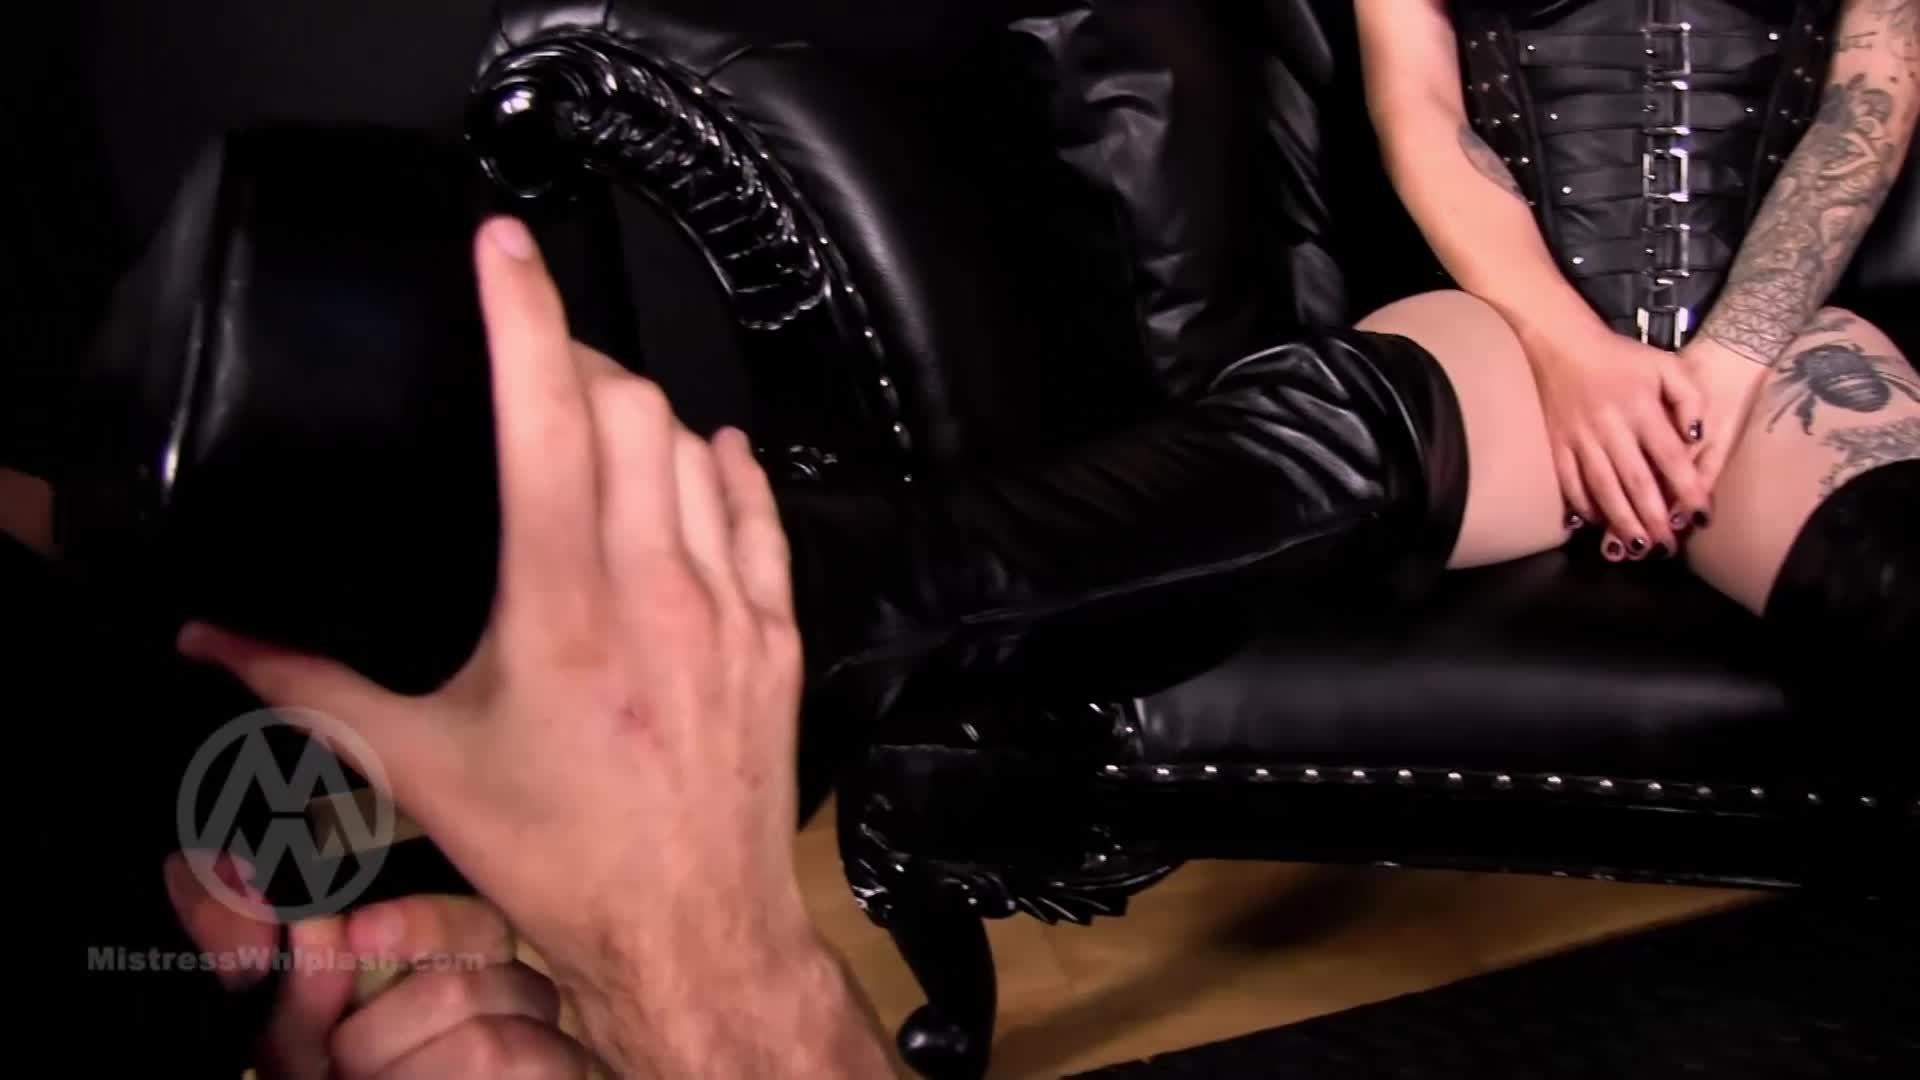 Mistress Teases Lesbian Slave